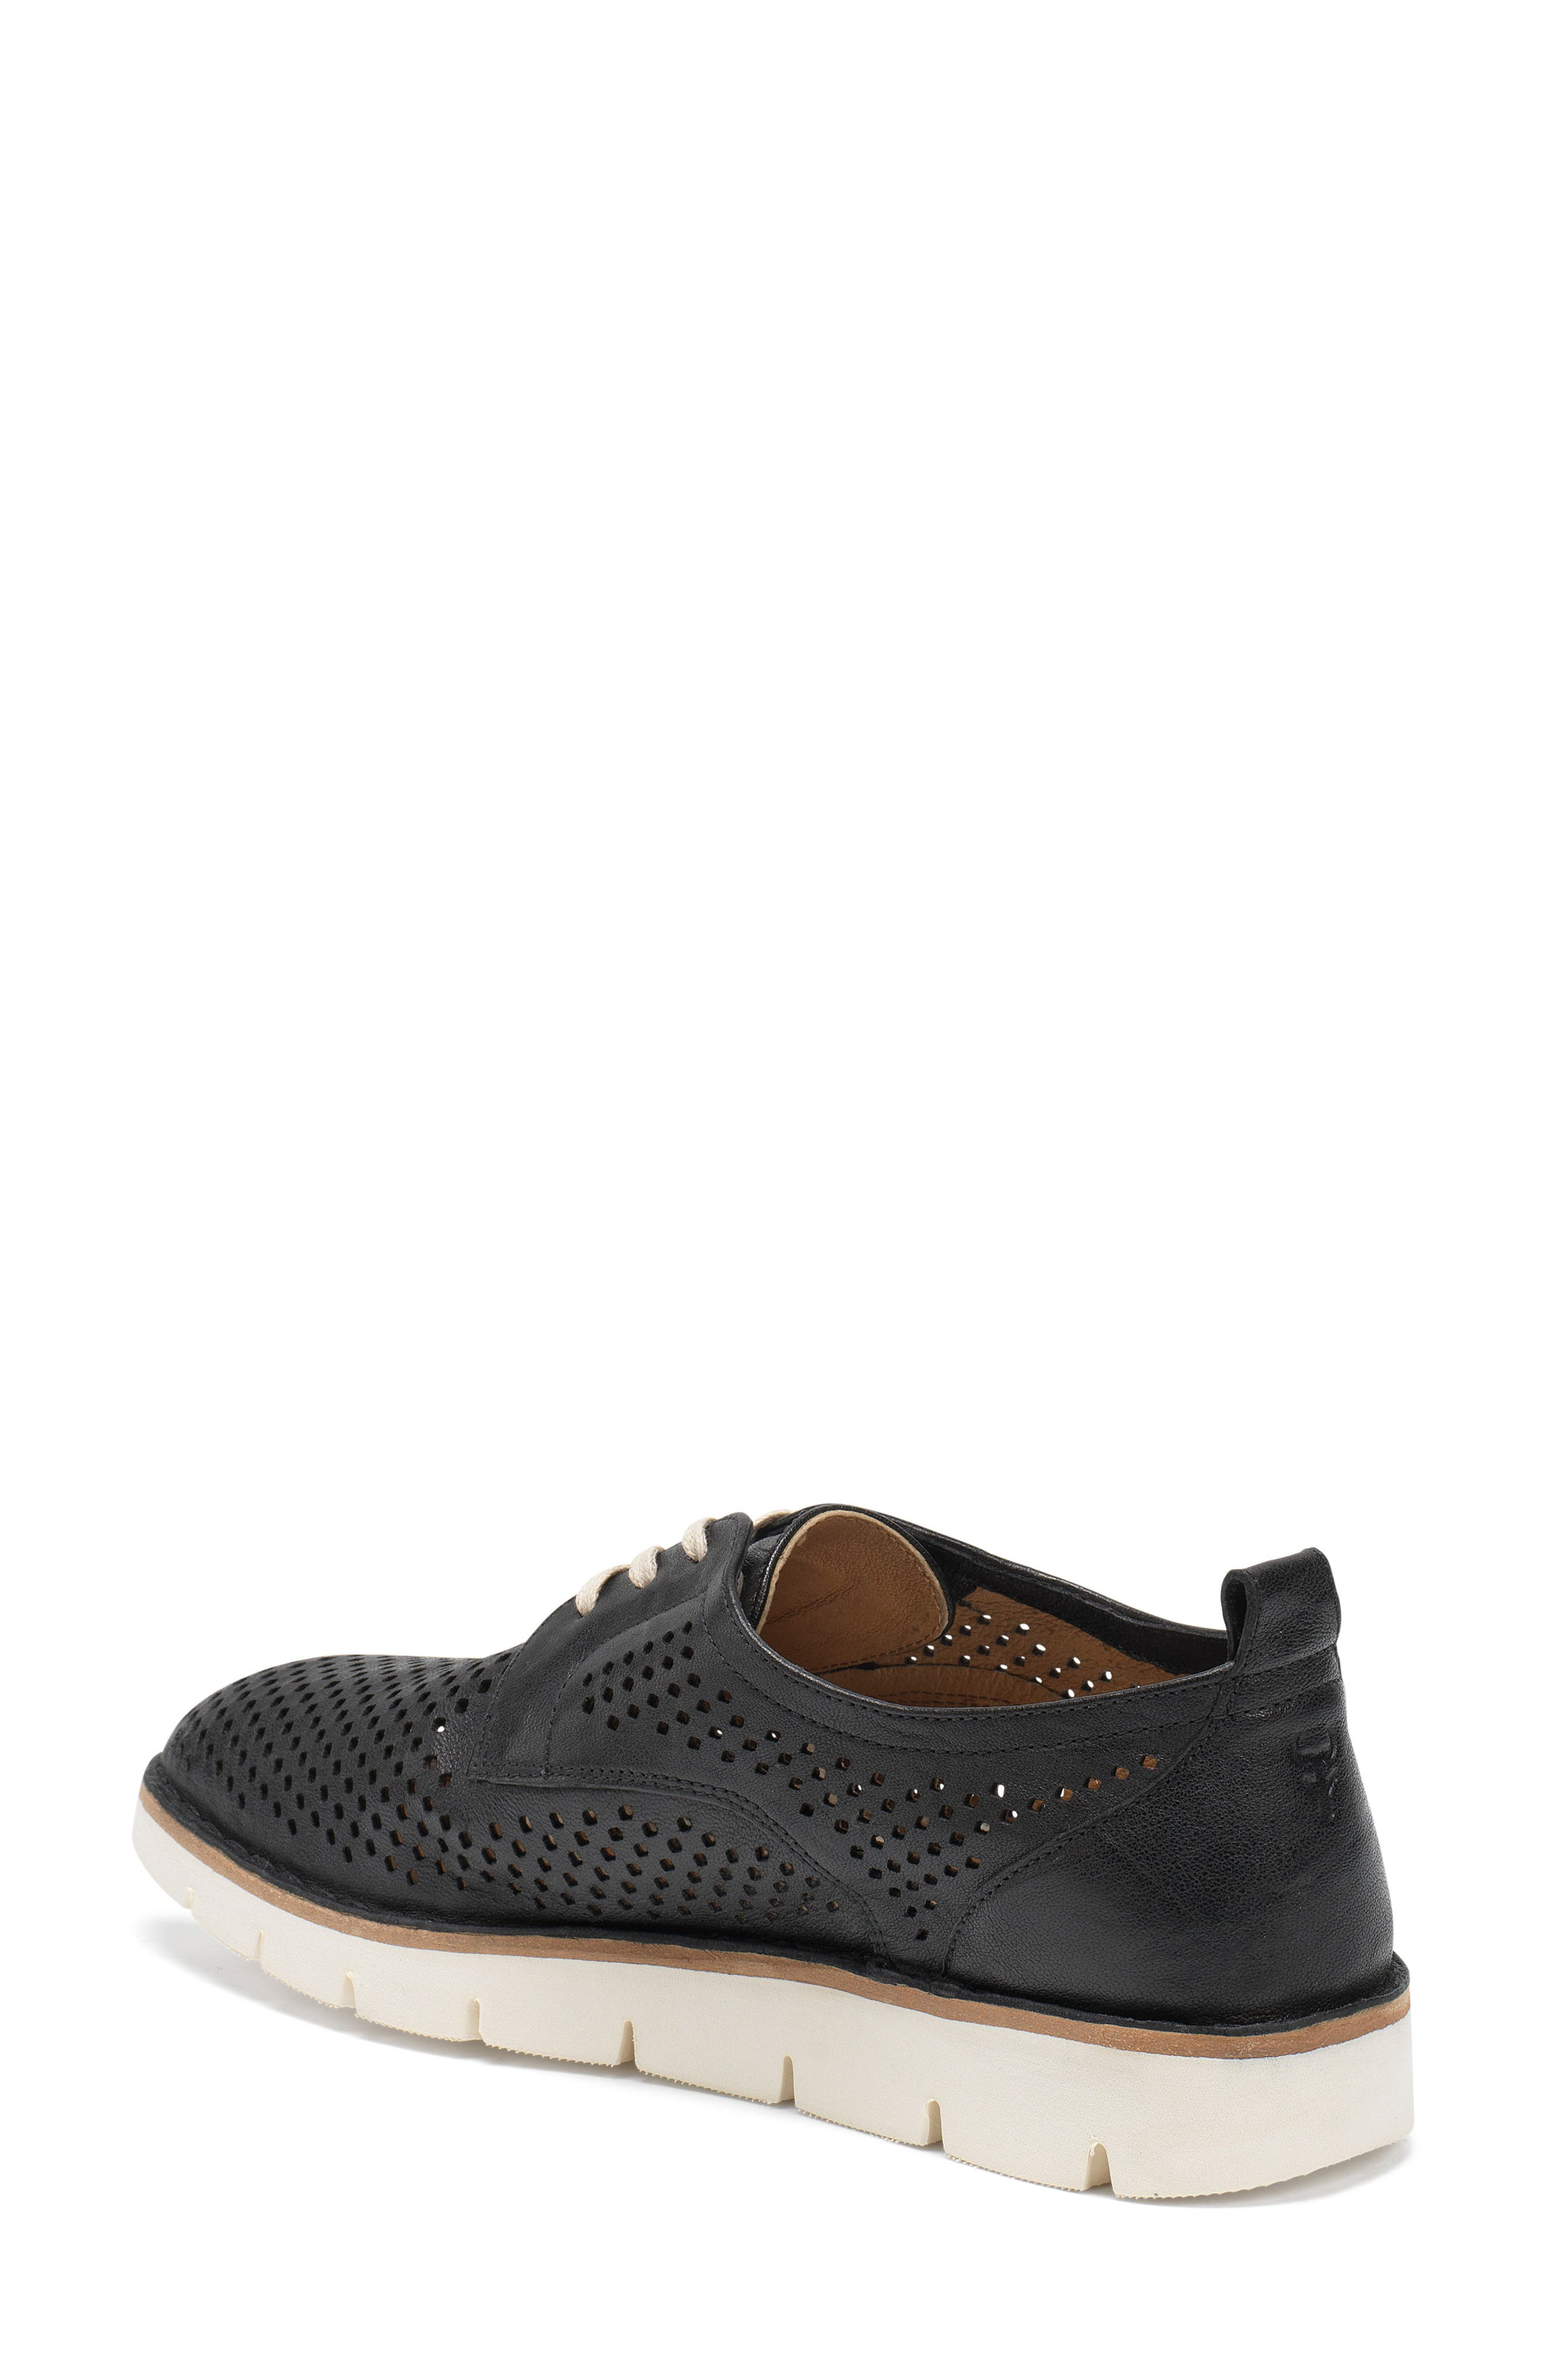 Lena Sneaker,                             Alternate thumbnail 2, color,                             Black Leather